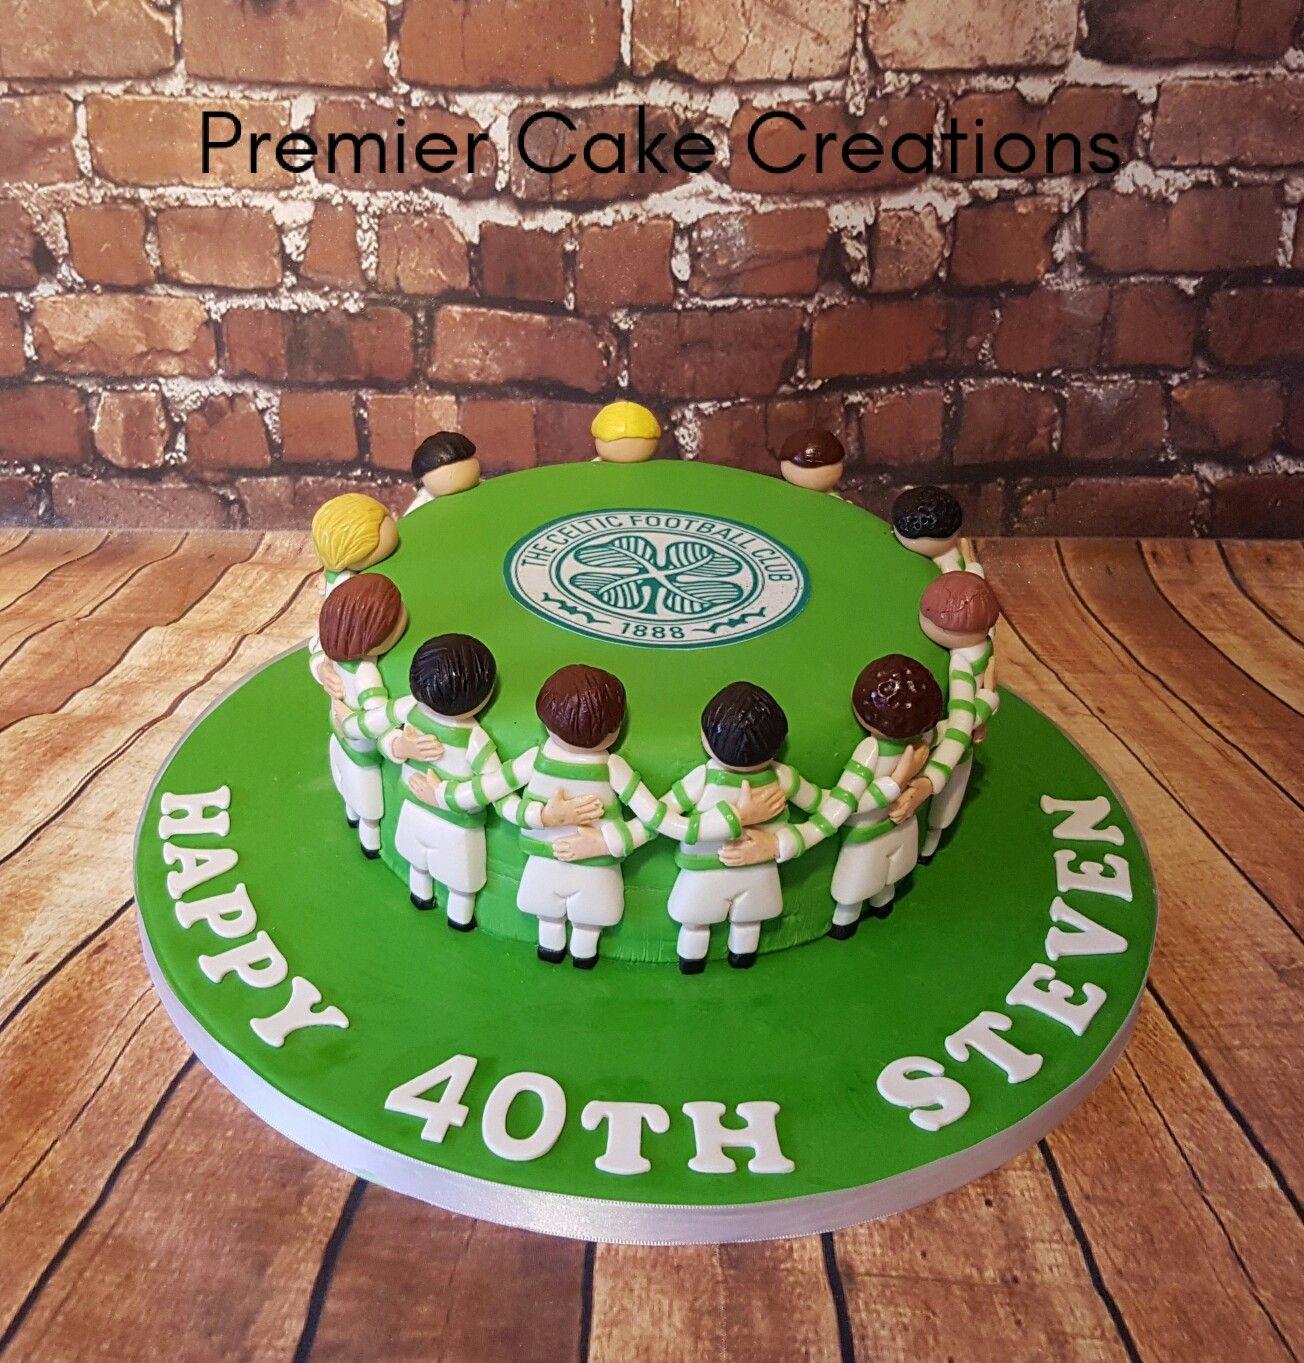 Celtic huddle cake 60th birthday cakes rugby cake